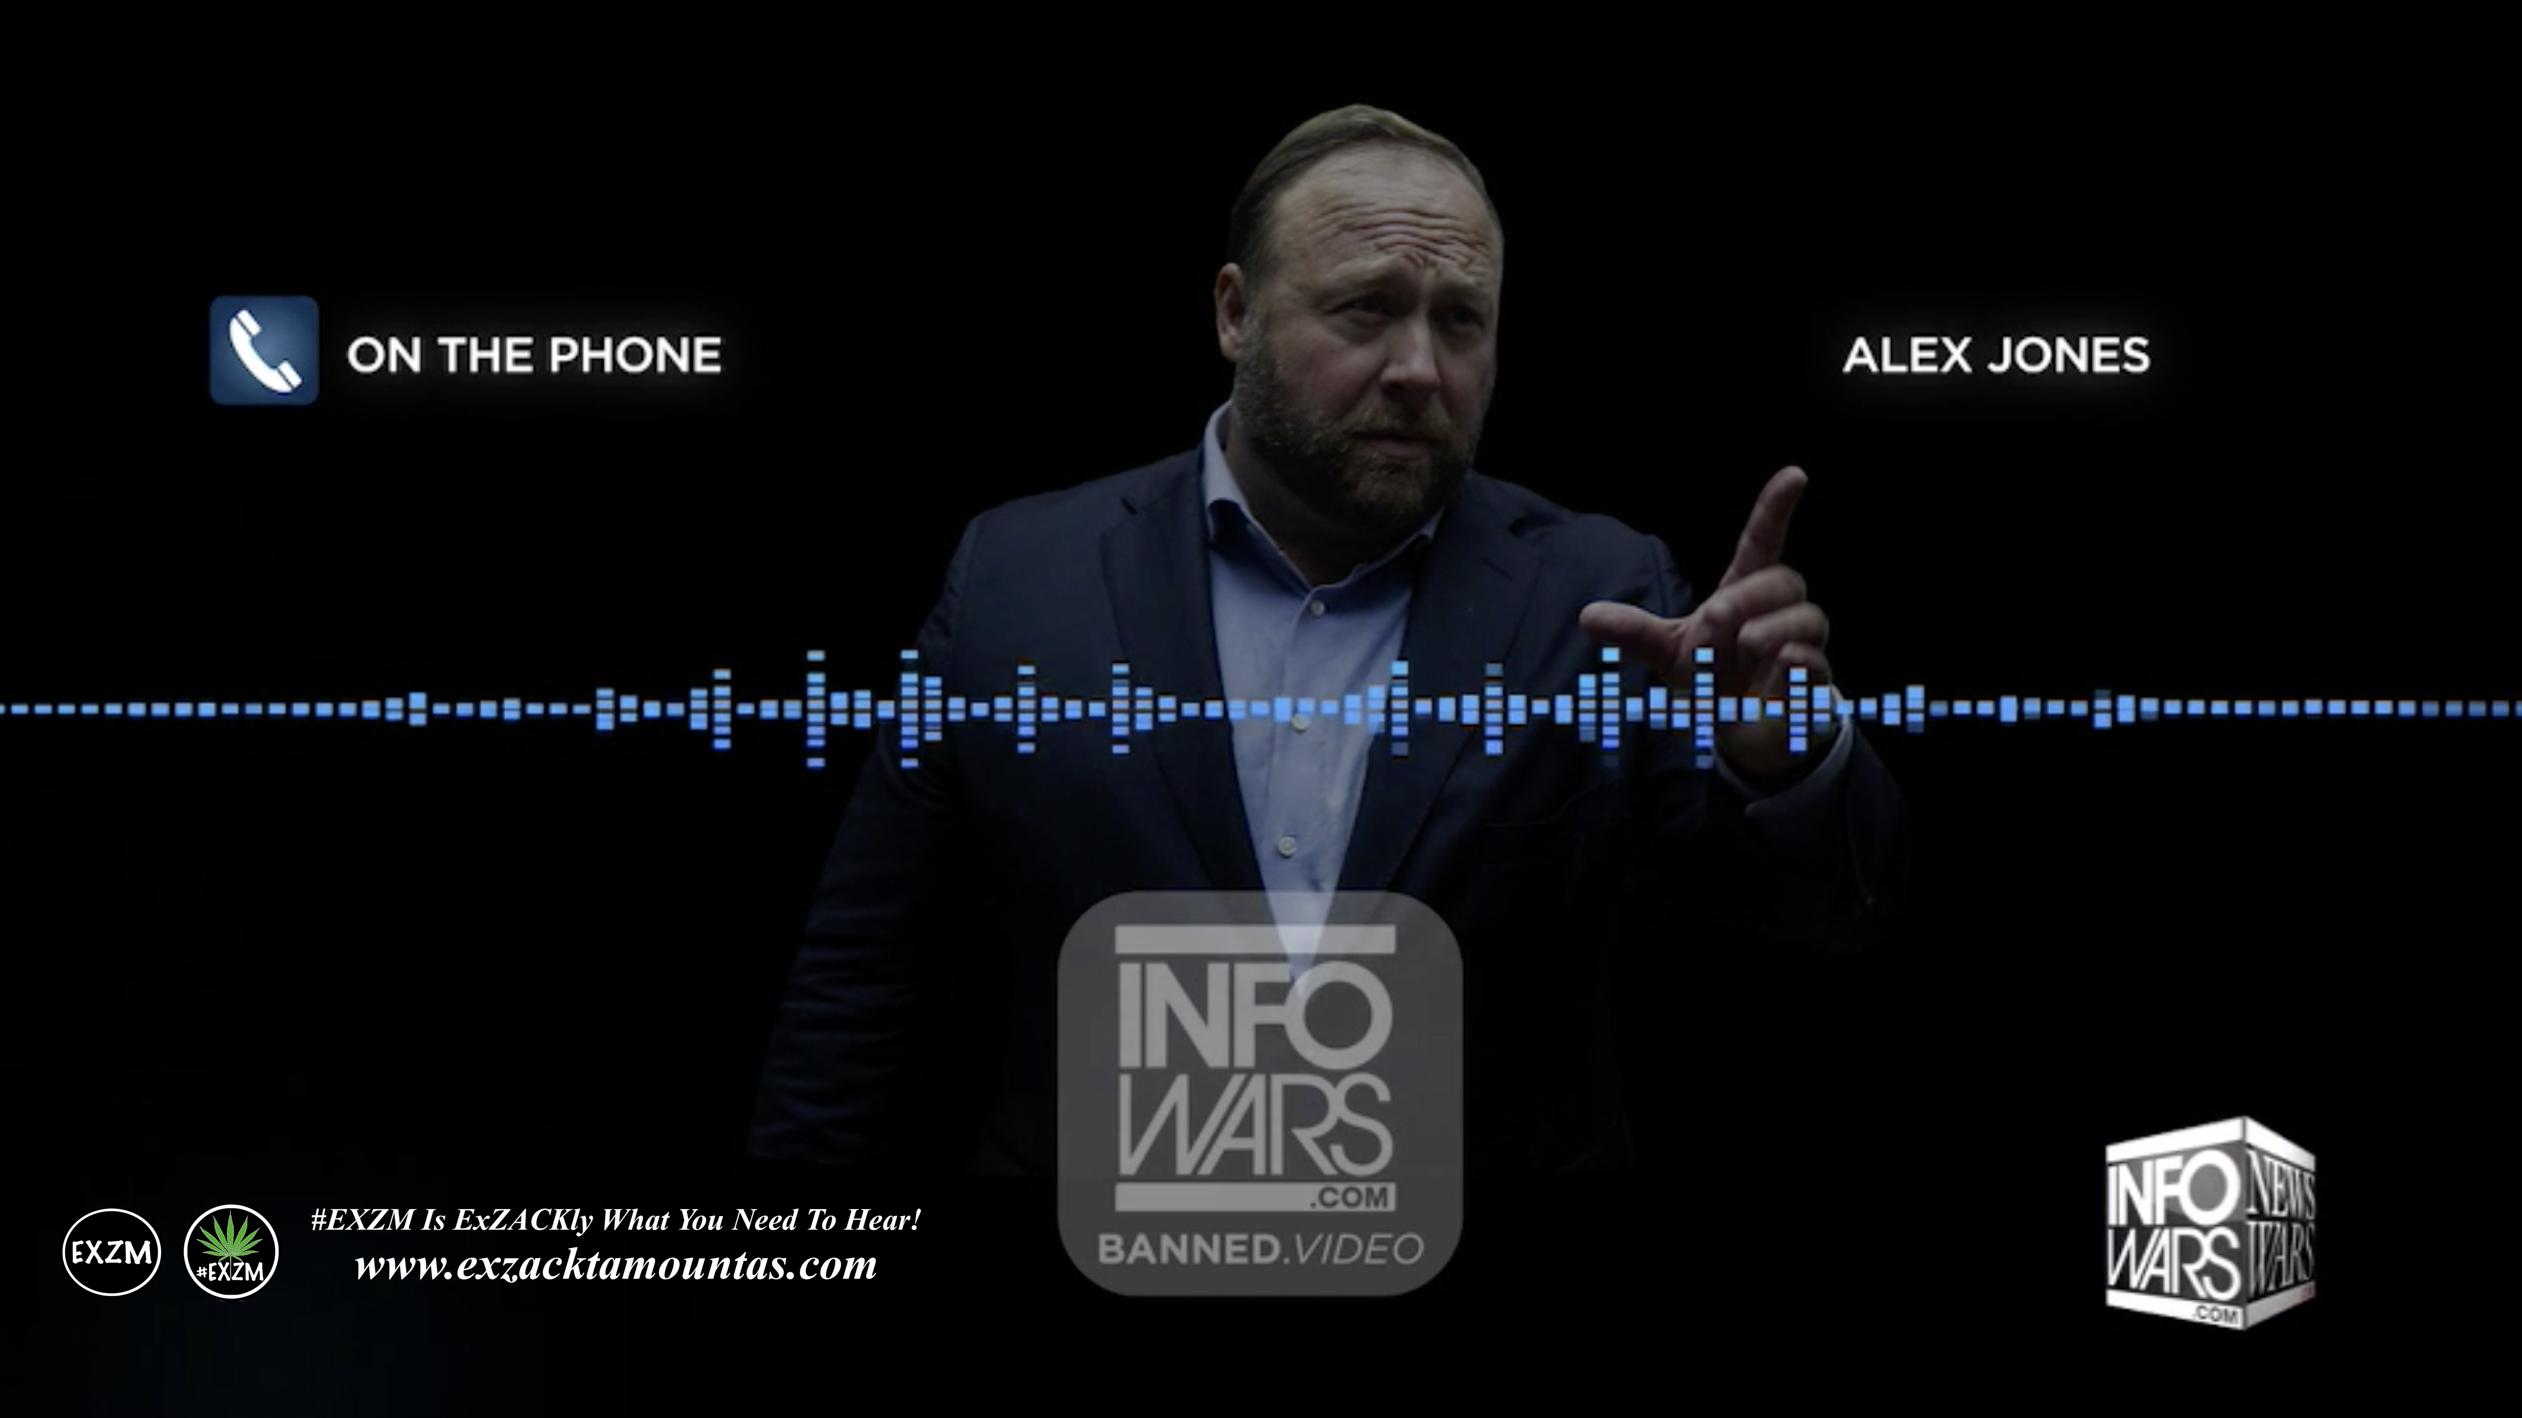 Alex Jones On The Phone Infowars Studio The Resistance Video EXZM Zack Mount January 24th 2021